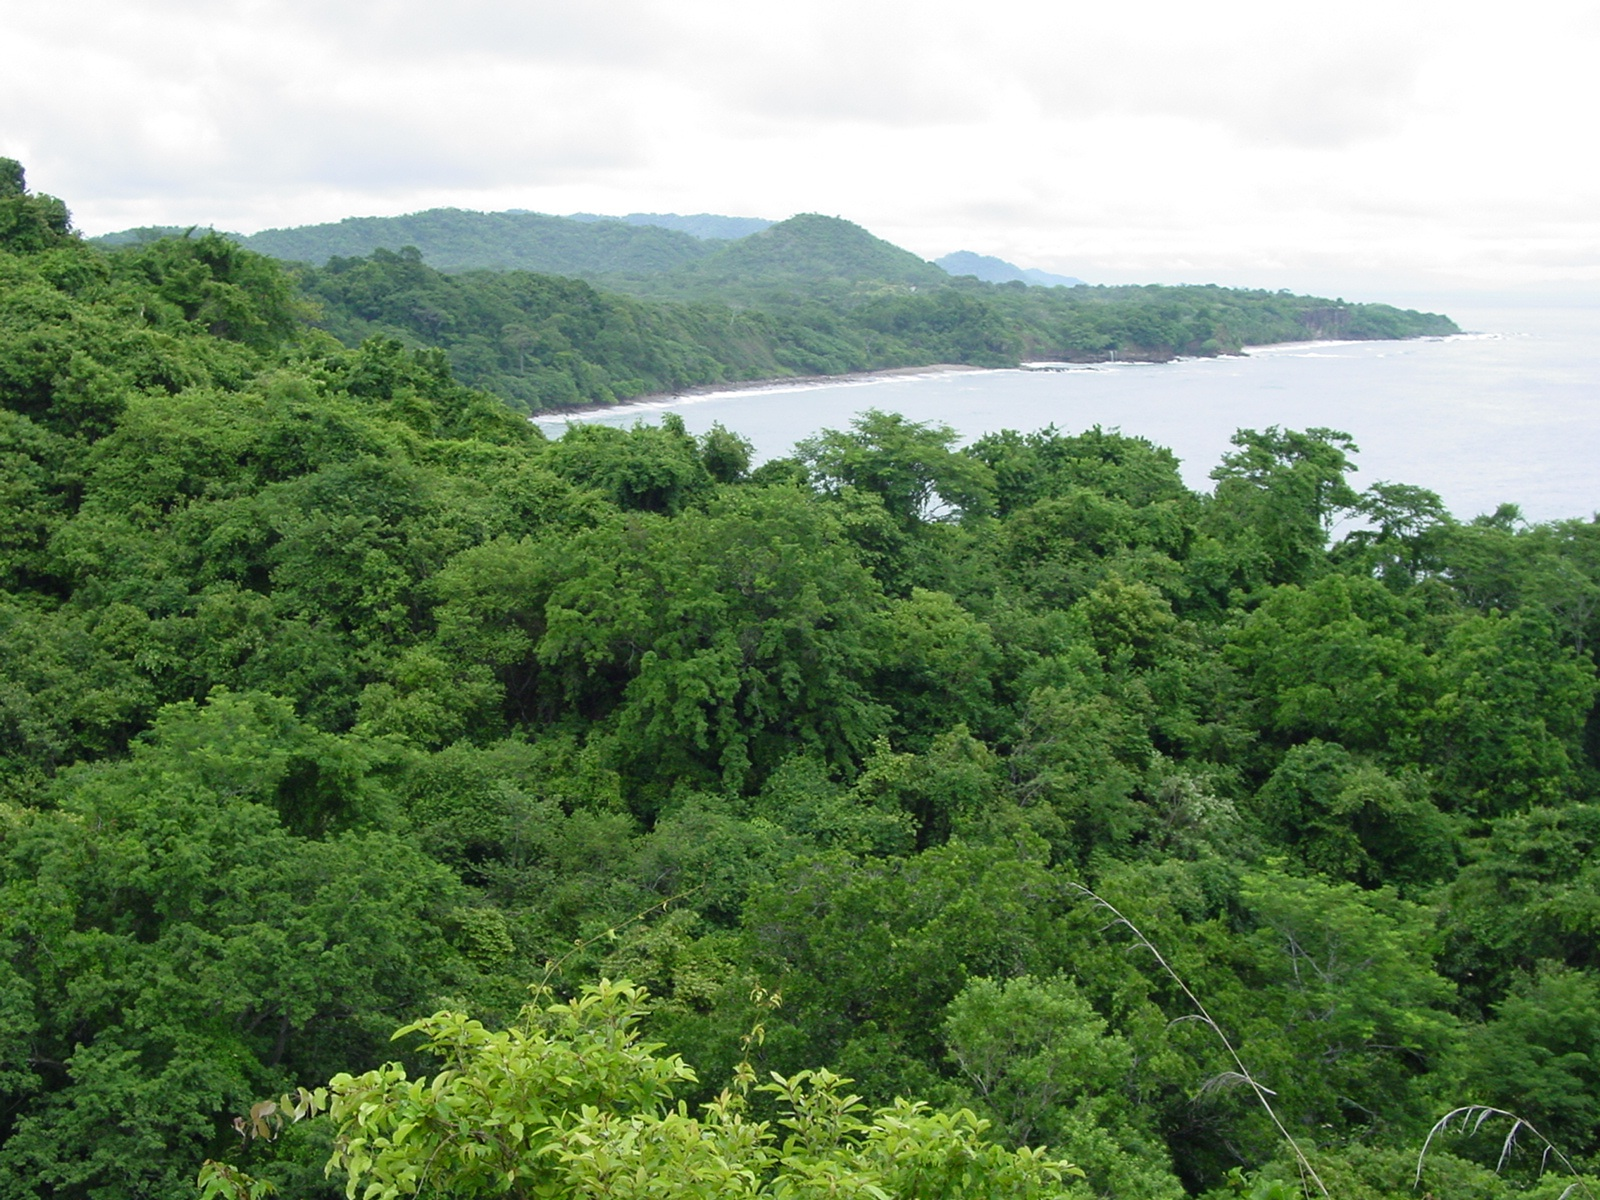 Puntarenas, Provincia de Puntarenas, Costa Rica